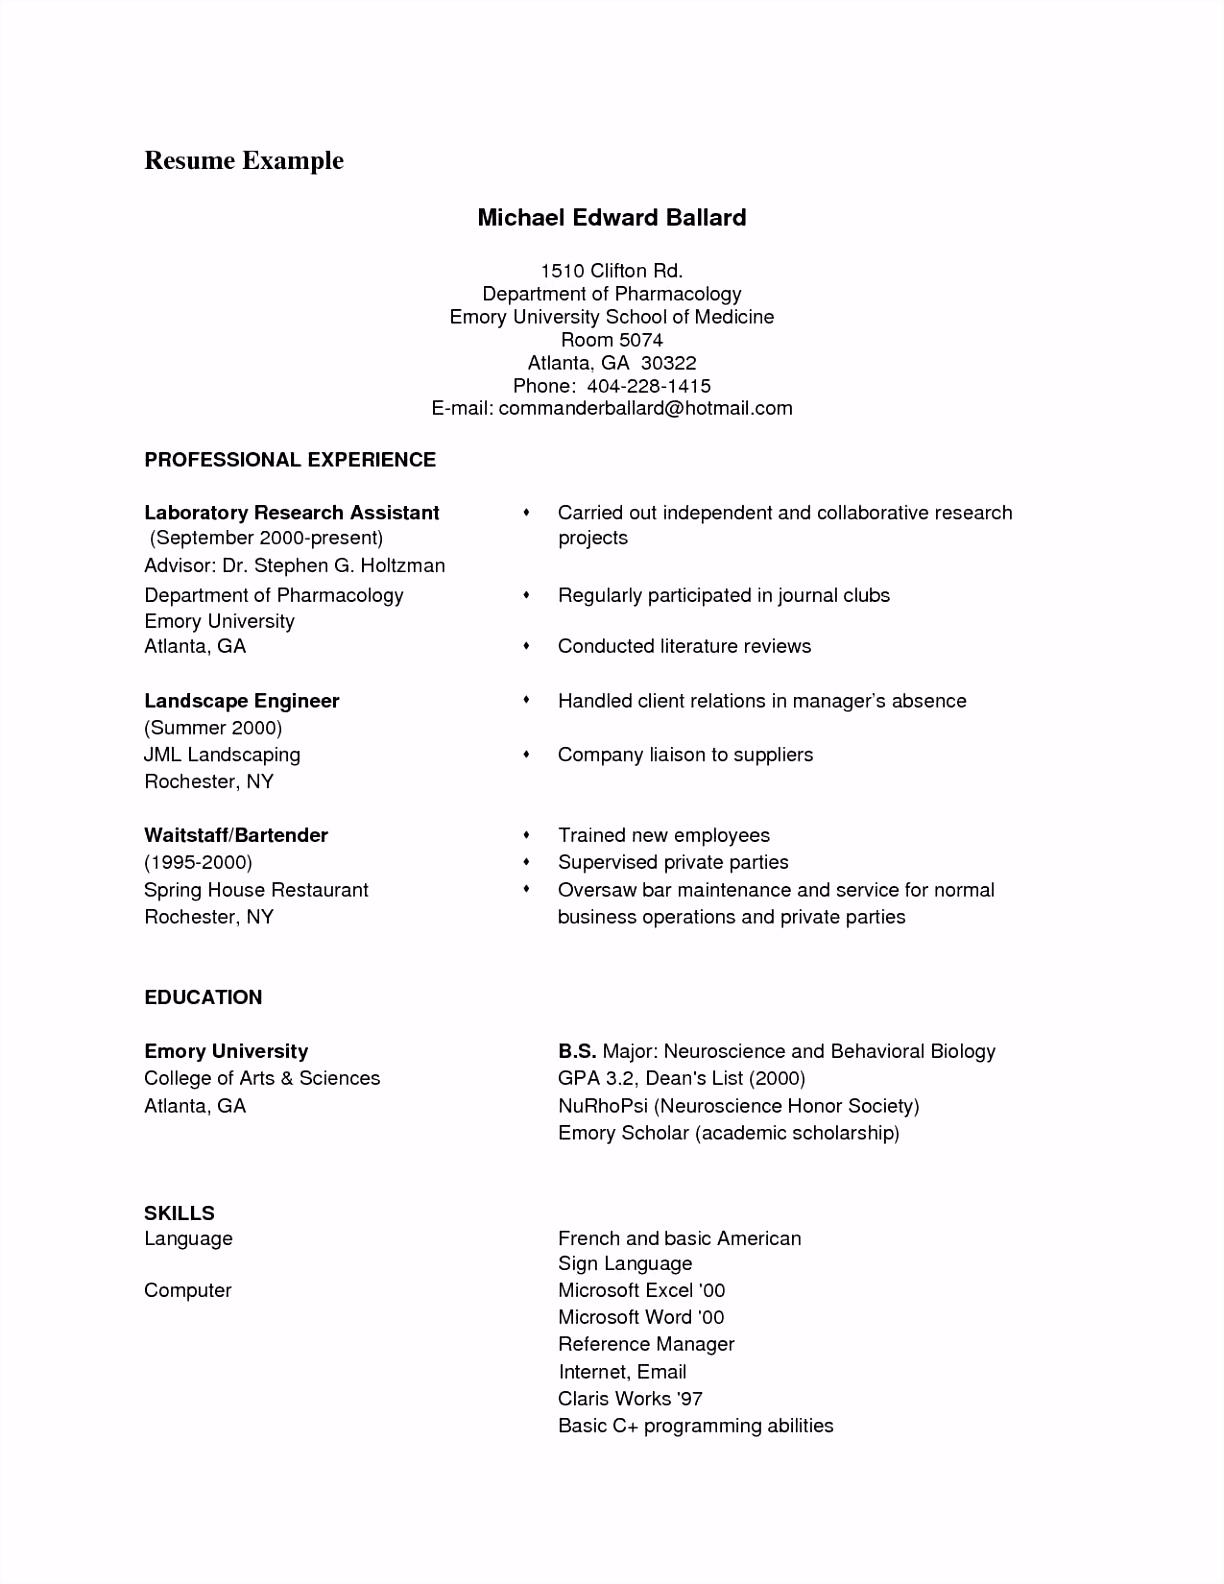 Microsoft Word Templates Free Download Elegant ¢‹†…¡ 0d Simple